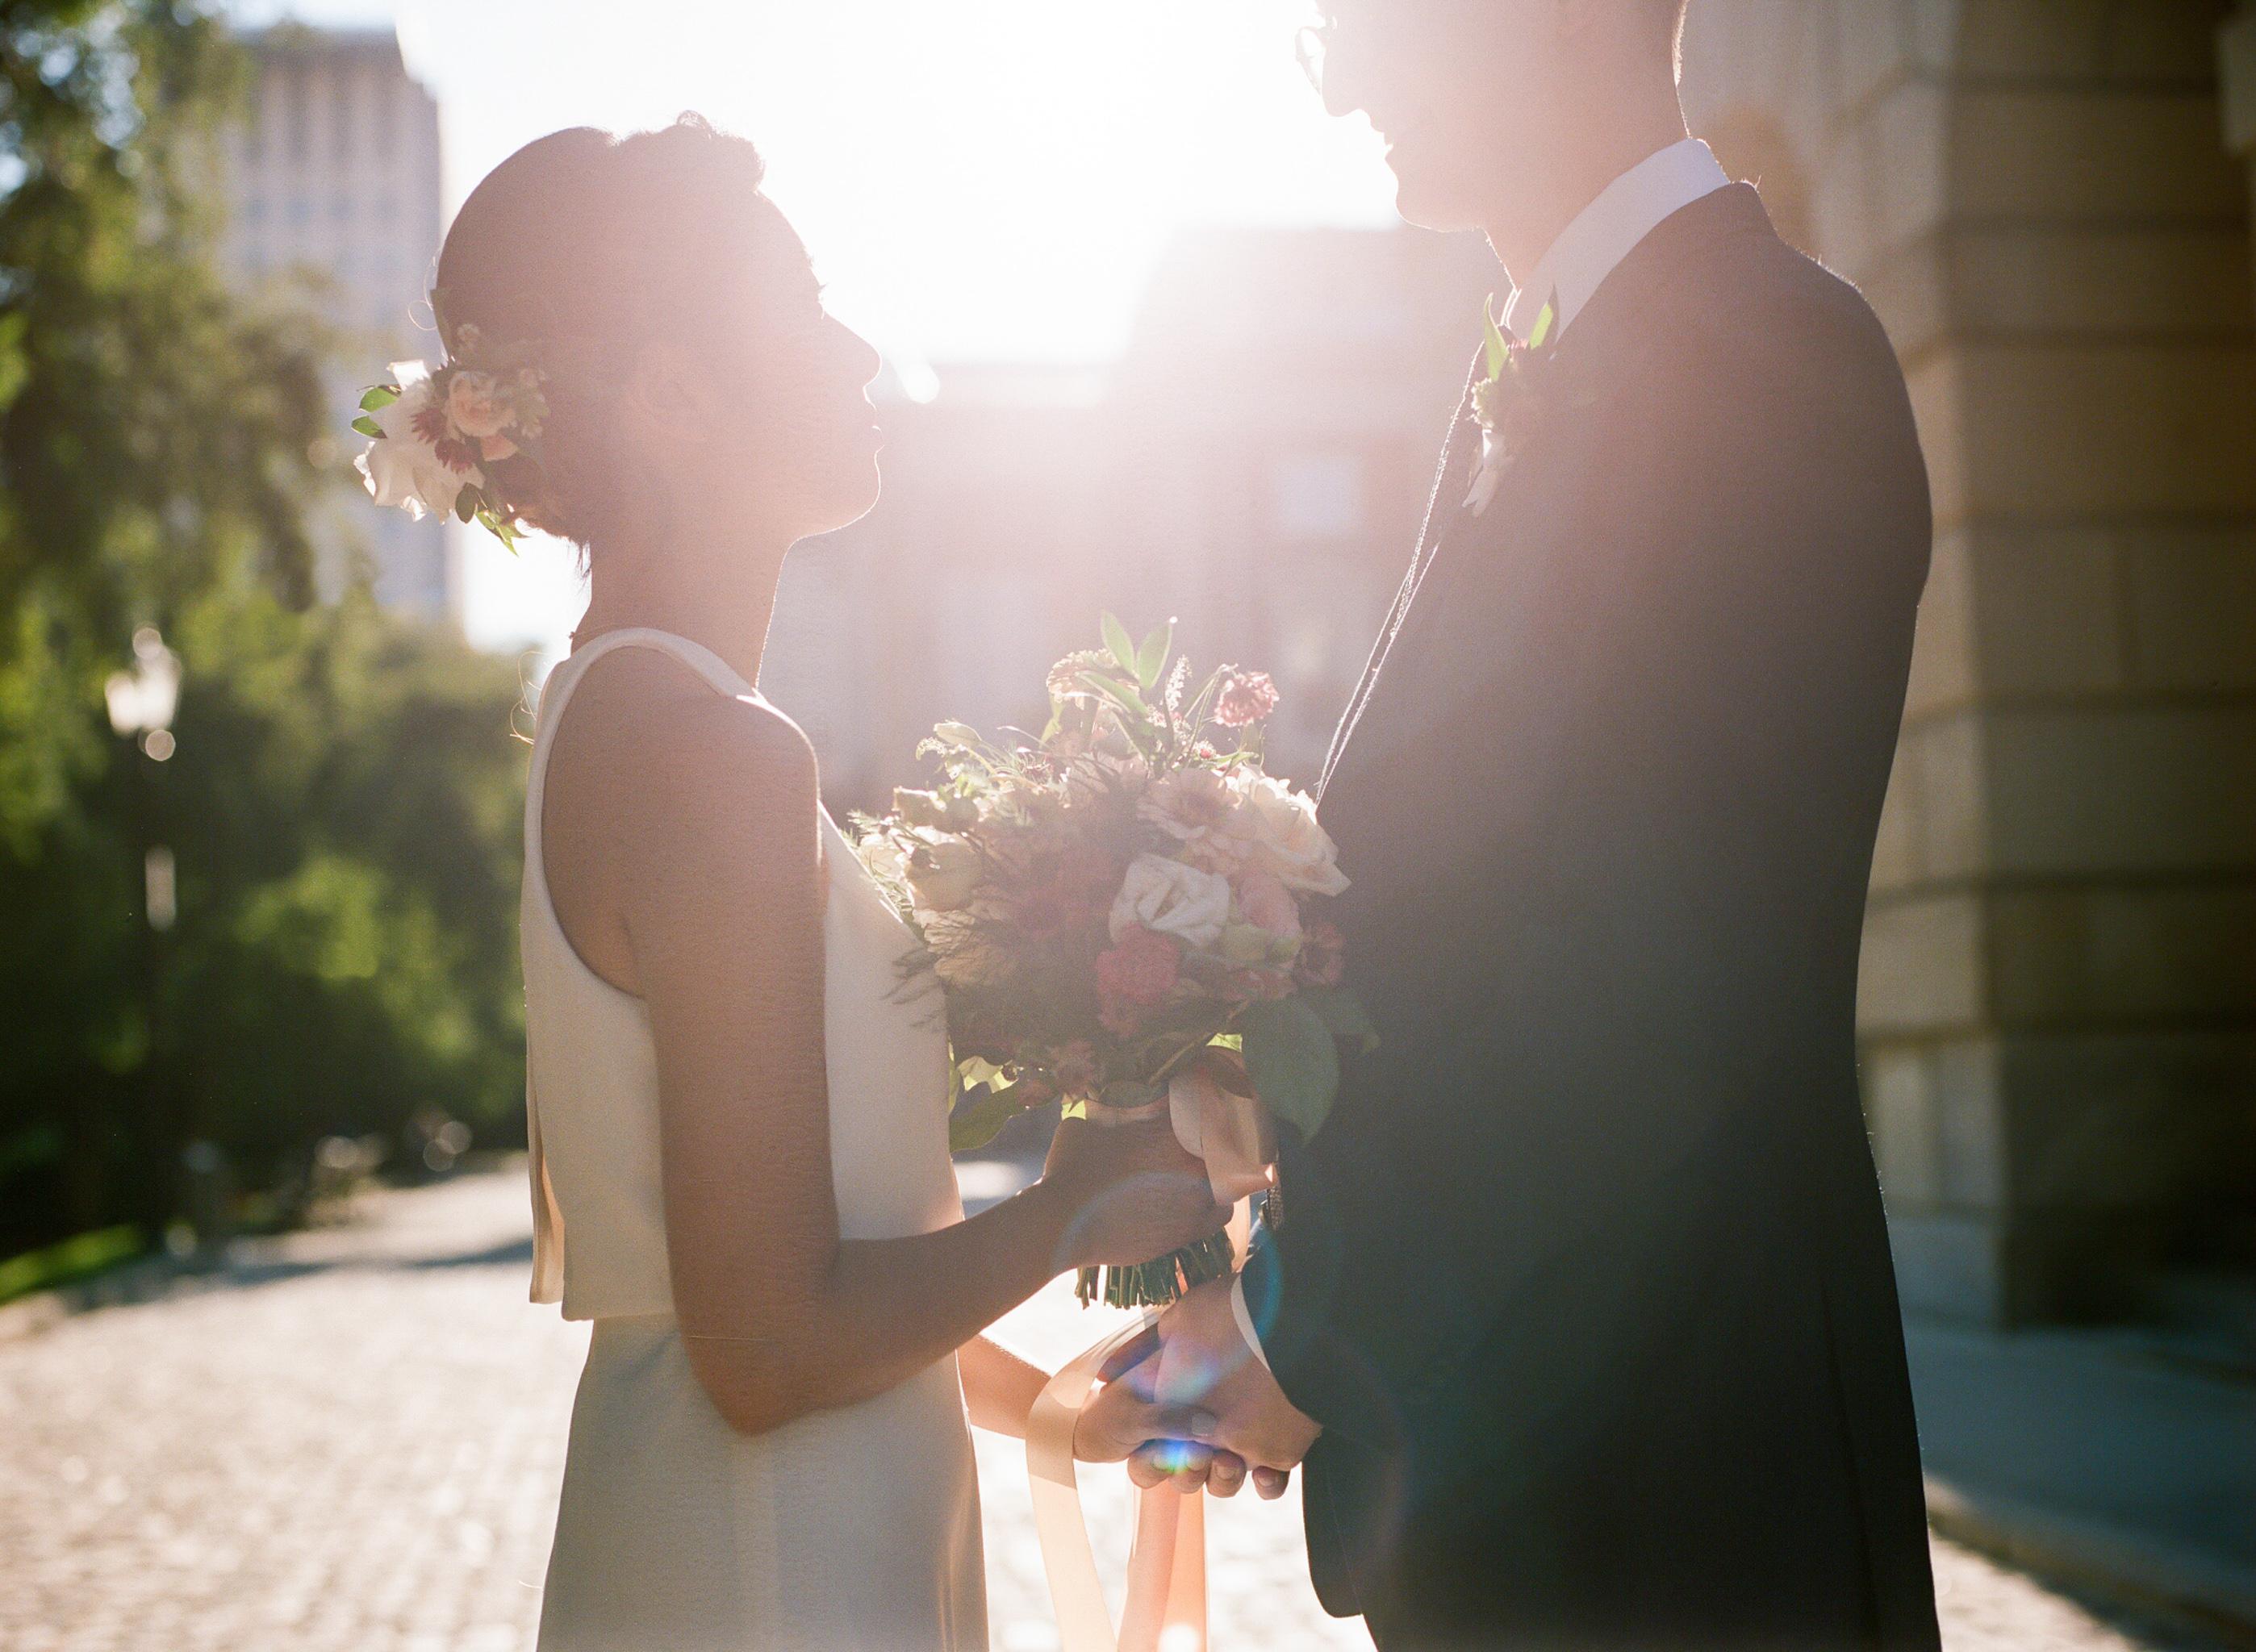 livetolovestudio_couplesportraits_4